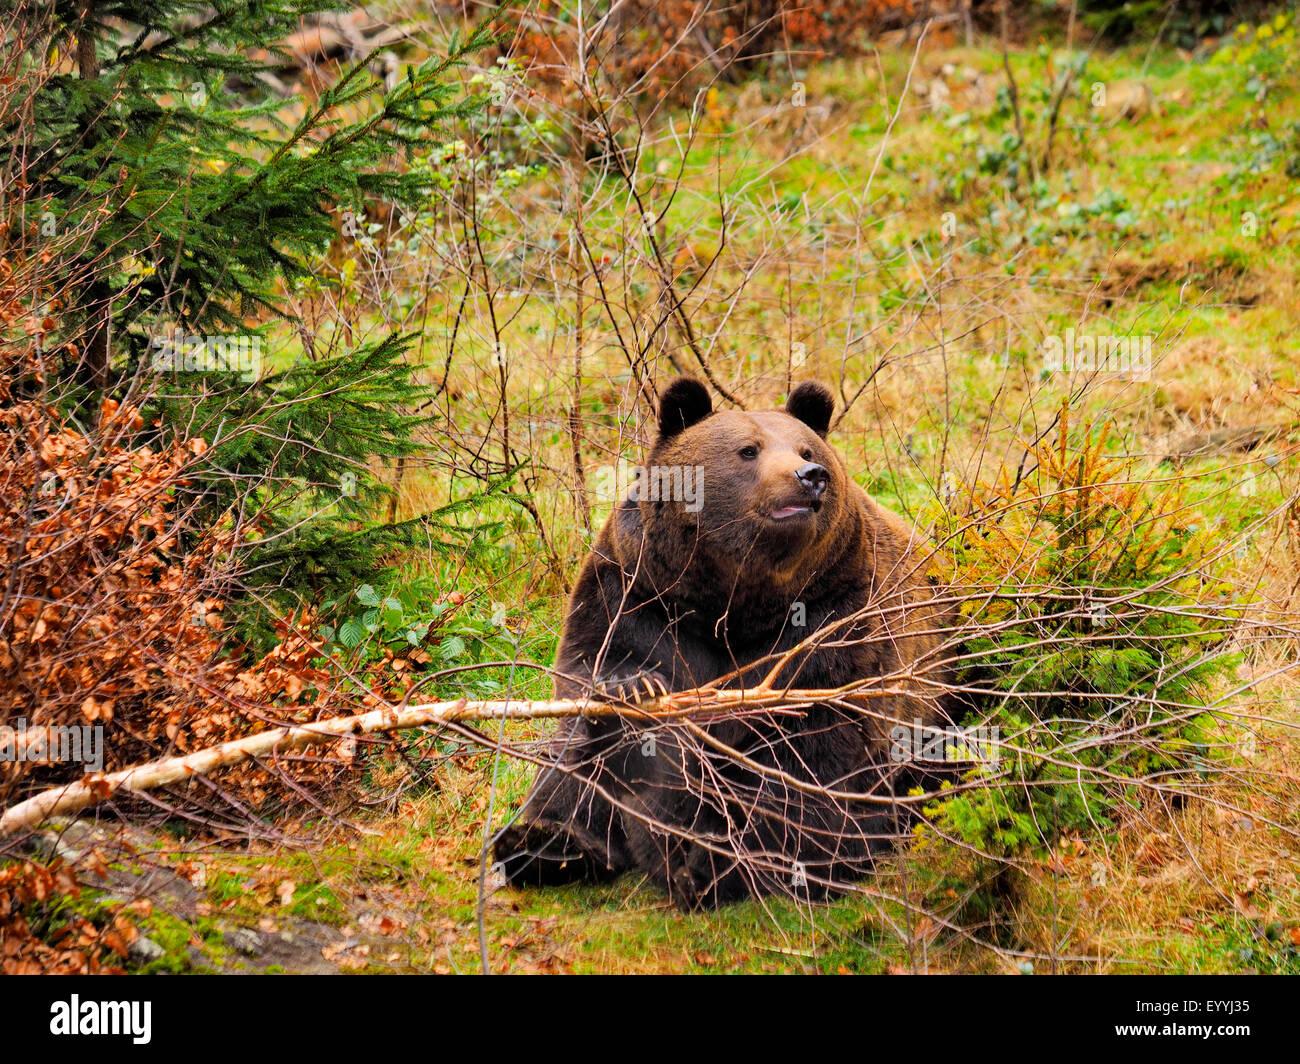 European brown bear (Ursus arctos arctos), bends over a young tree, Germany, Bavaria, Bavarian Forest National Park - Stock Image